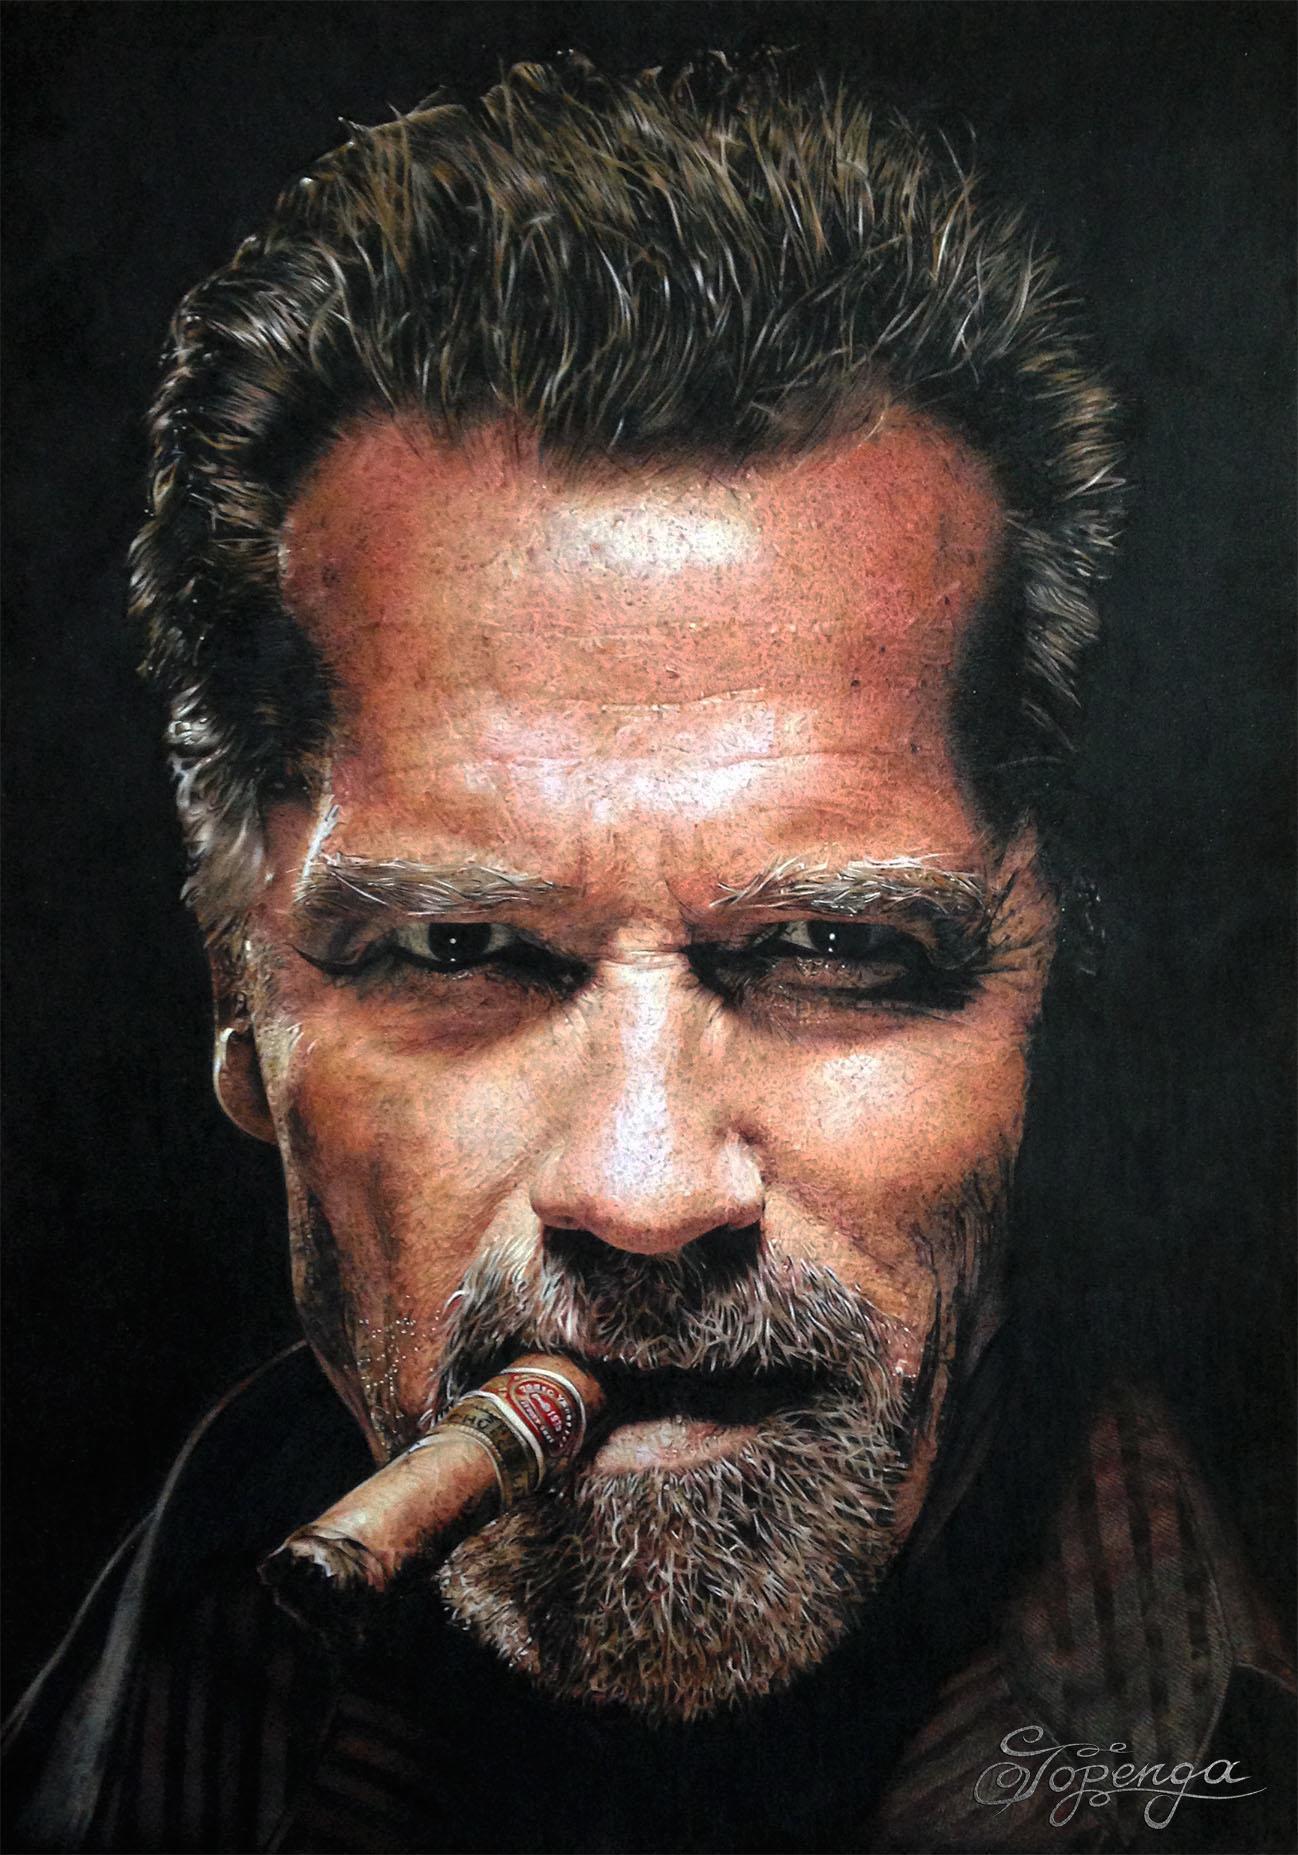 Title: Arnold Schwarzenegger Medium: Coloured Pencil Size: 29,7 x 42 cm